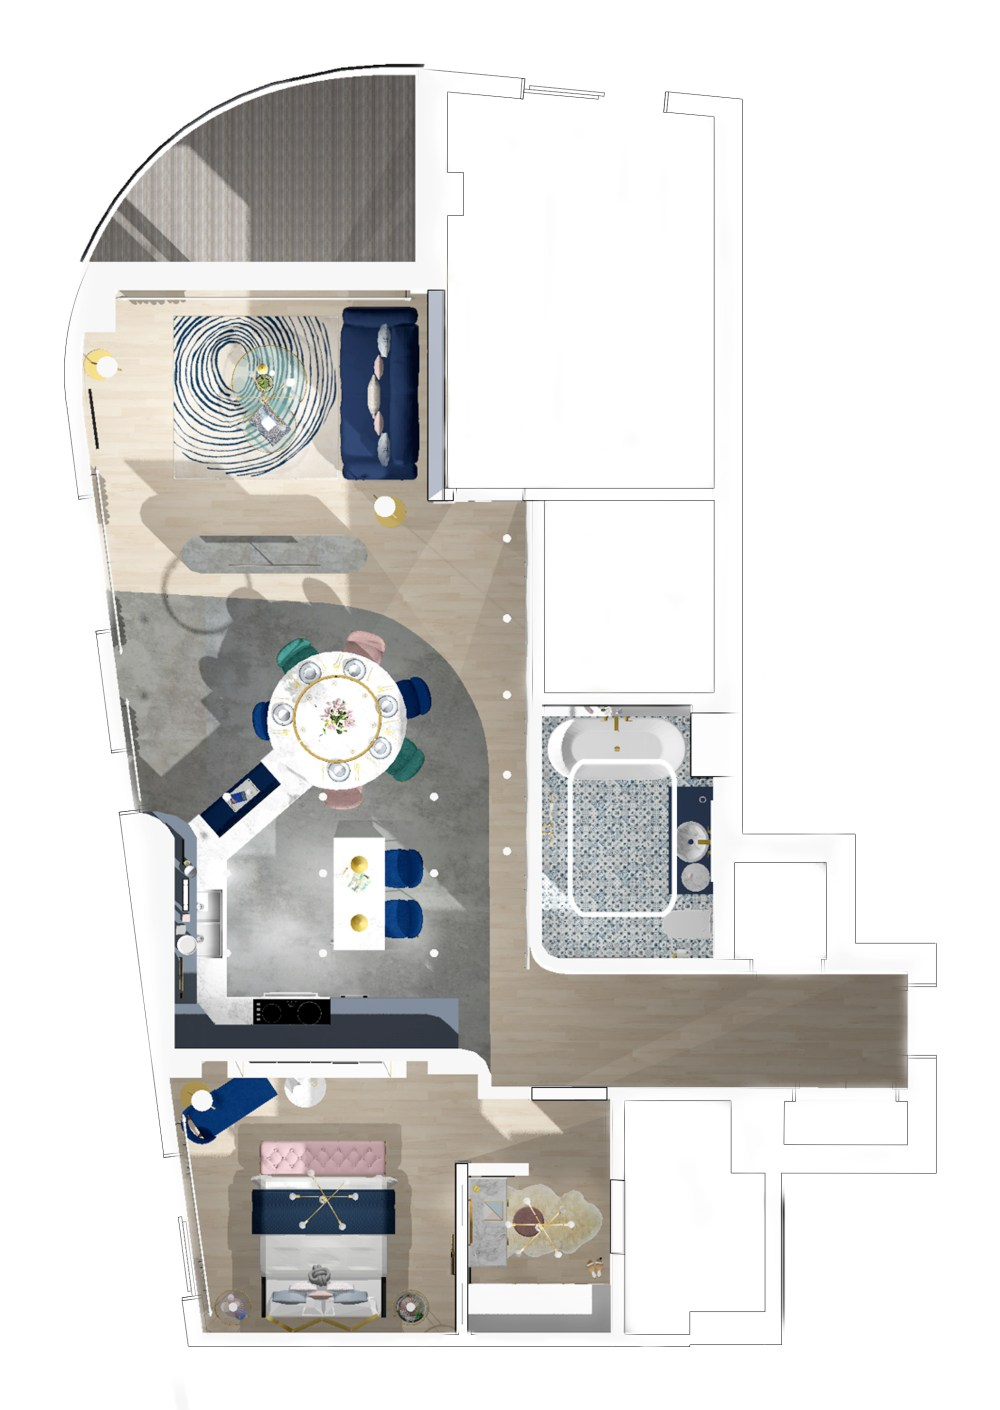 FMP floor plan for product spec